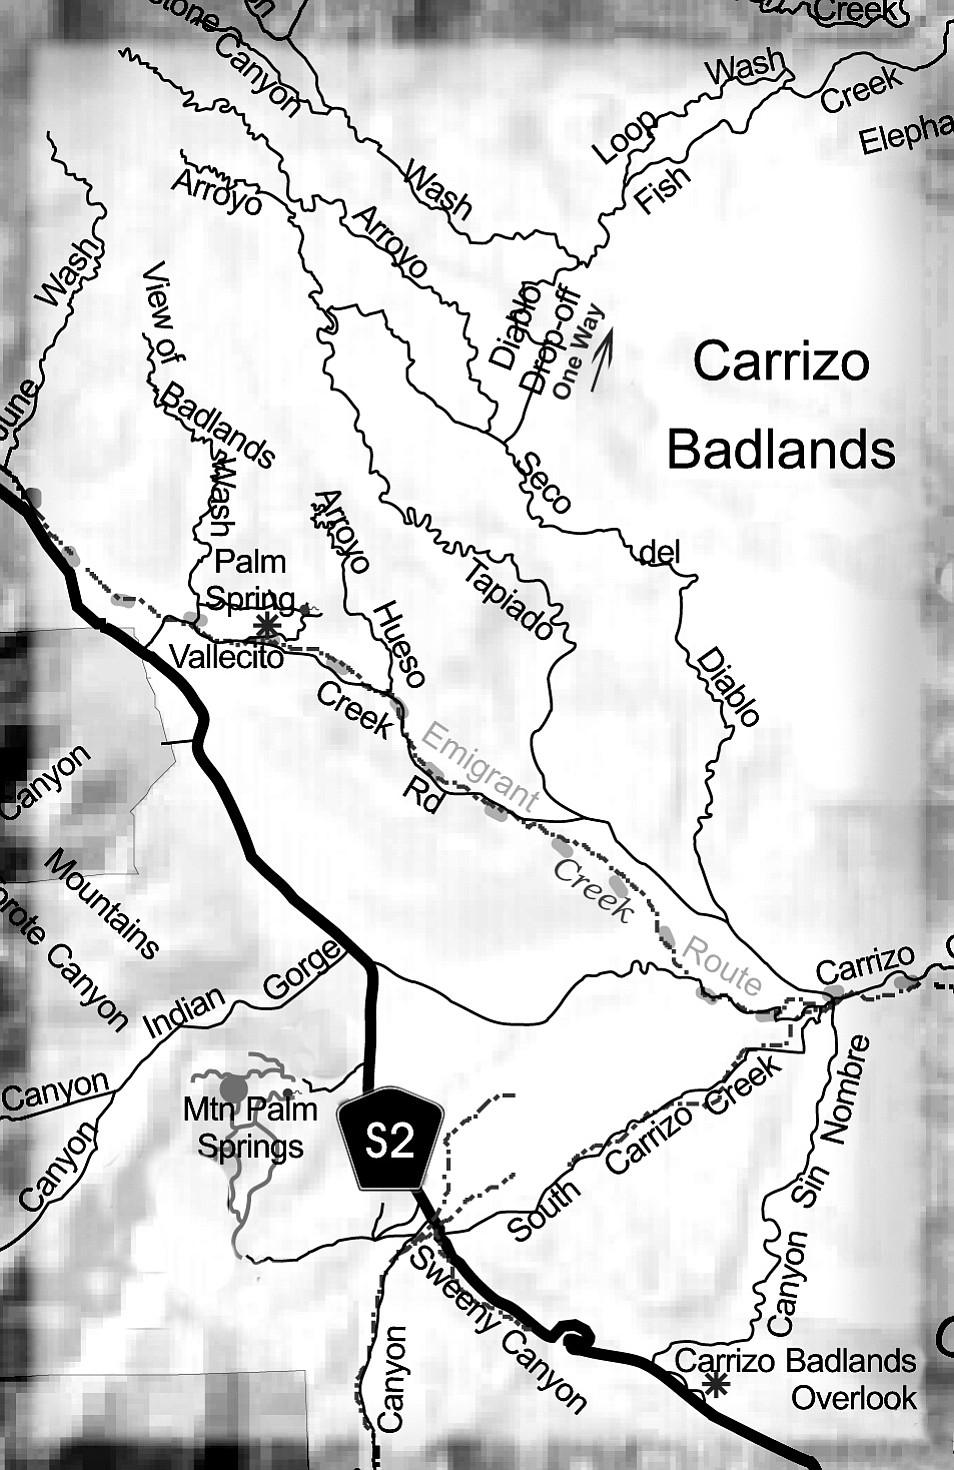 U.S. Parks Department map of Carrizo Badlands